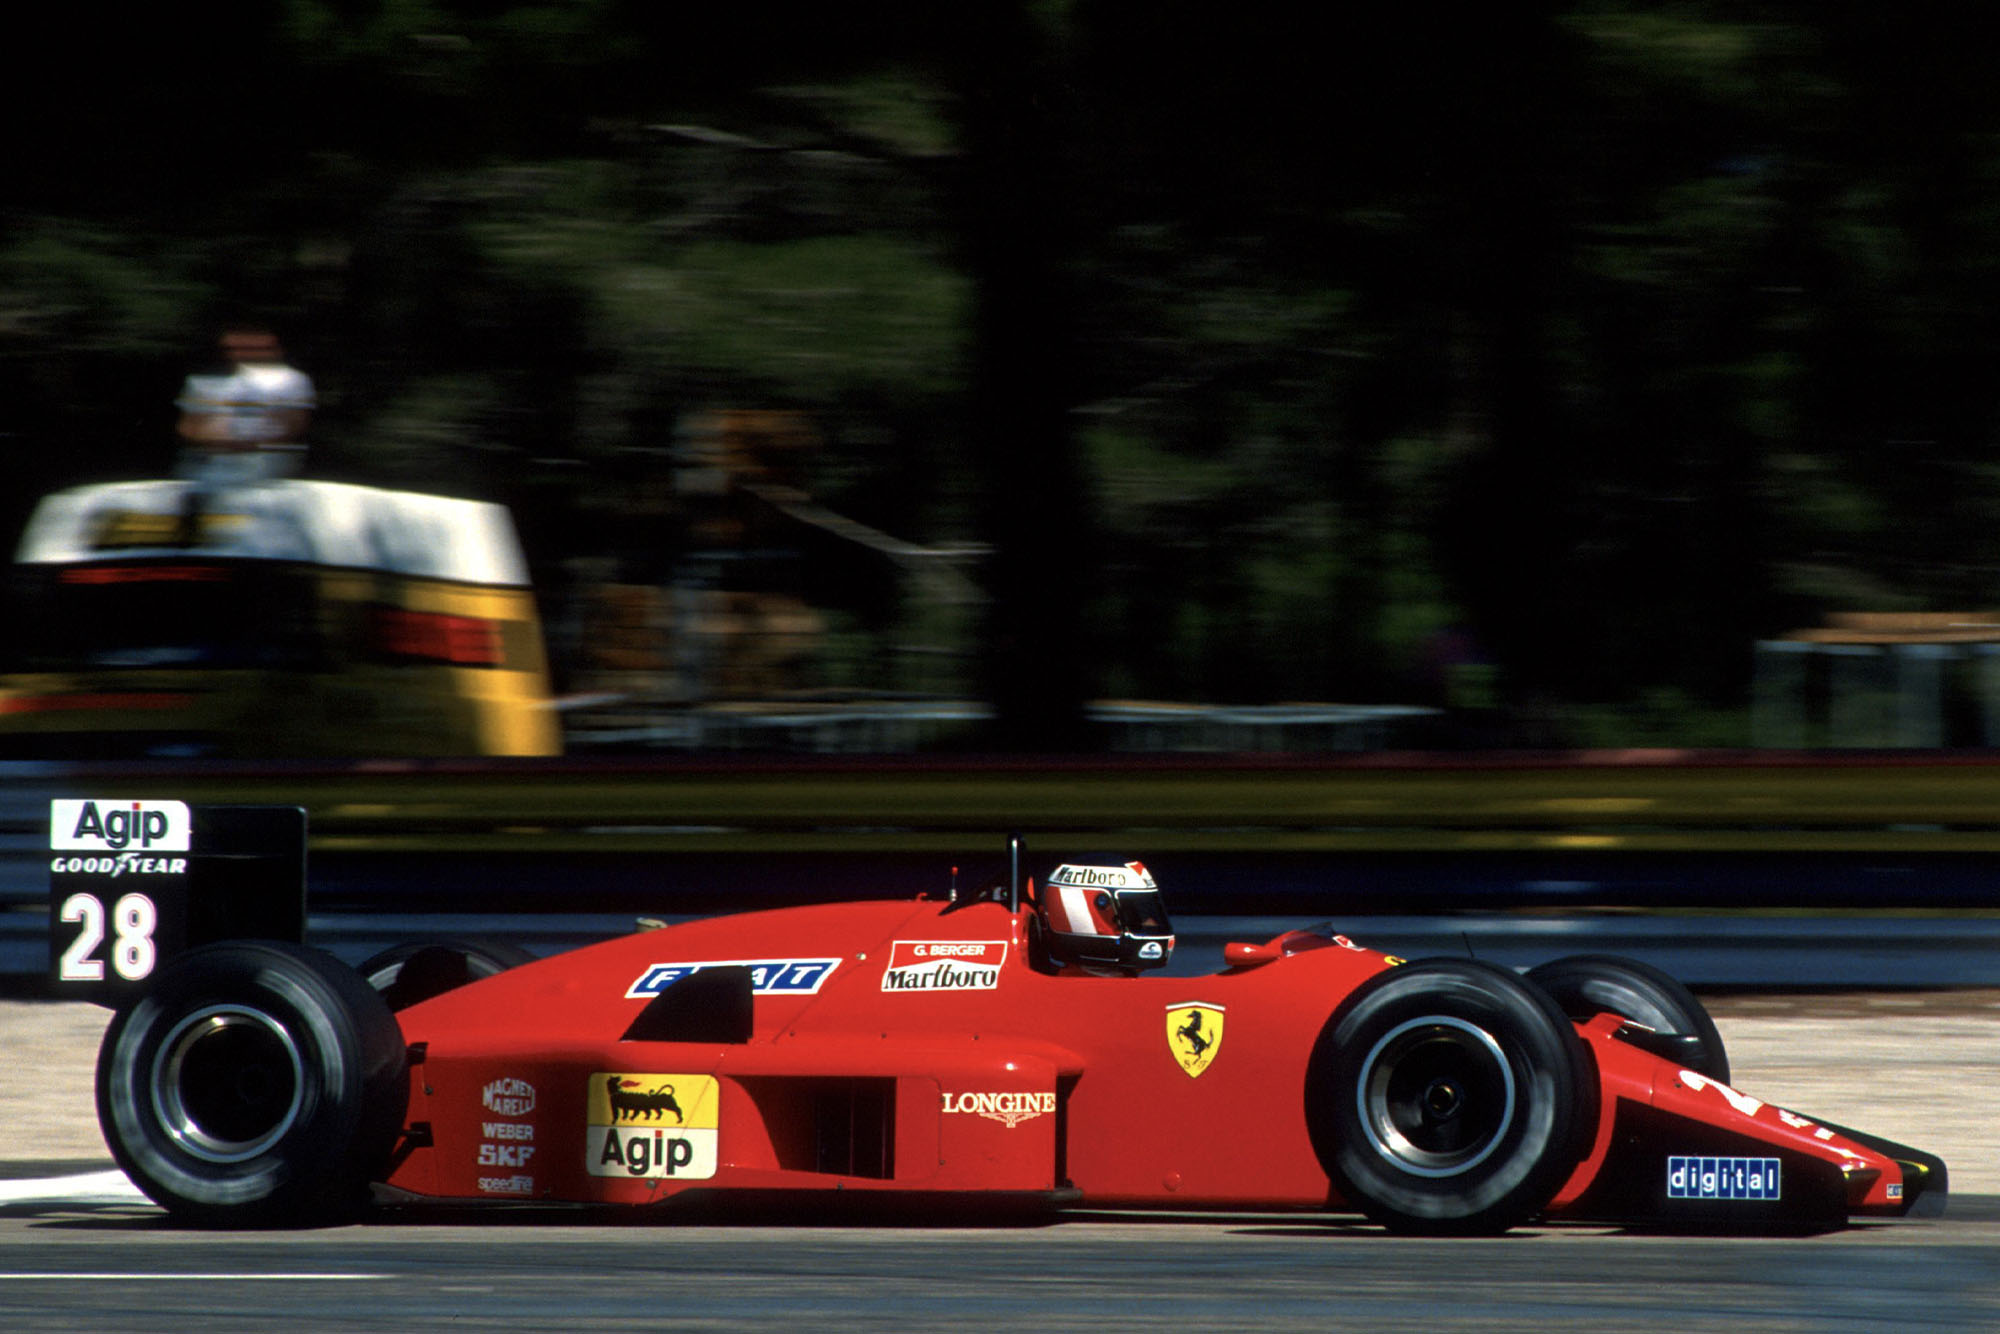 1988 FRA GP Berger Q3